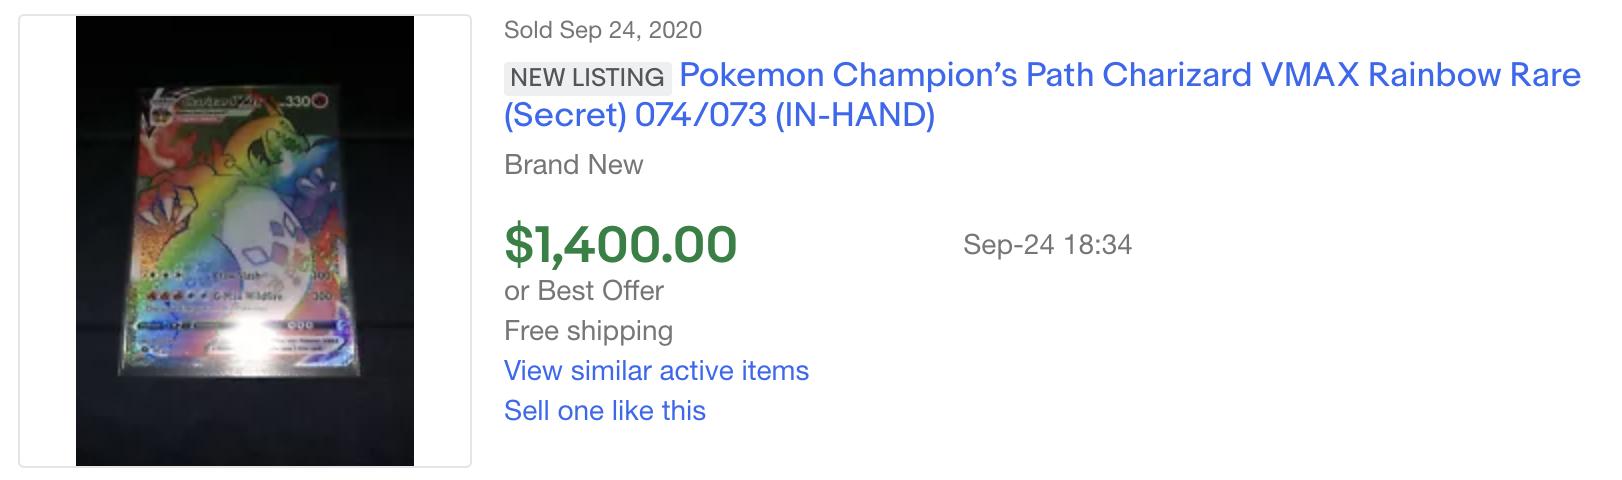 pokemon charizard ebay listing